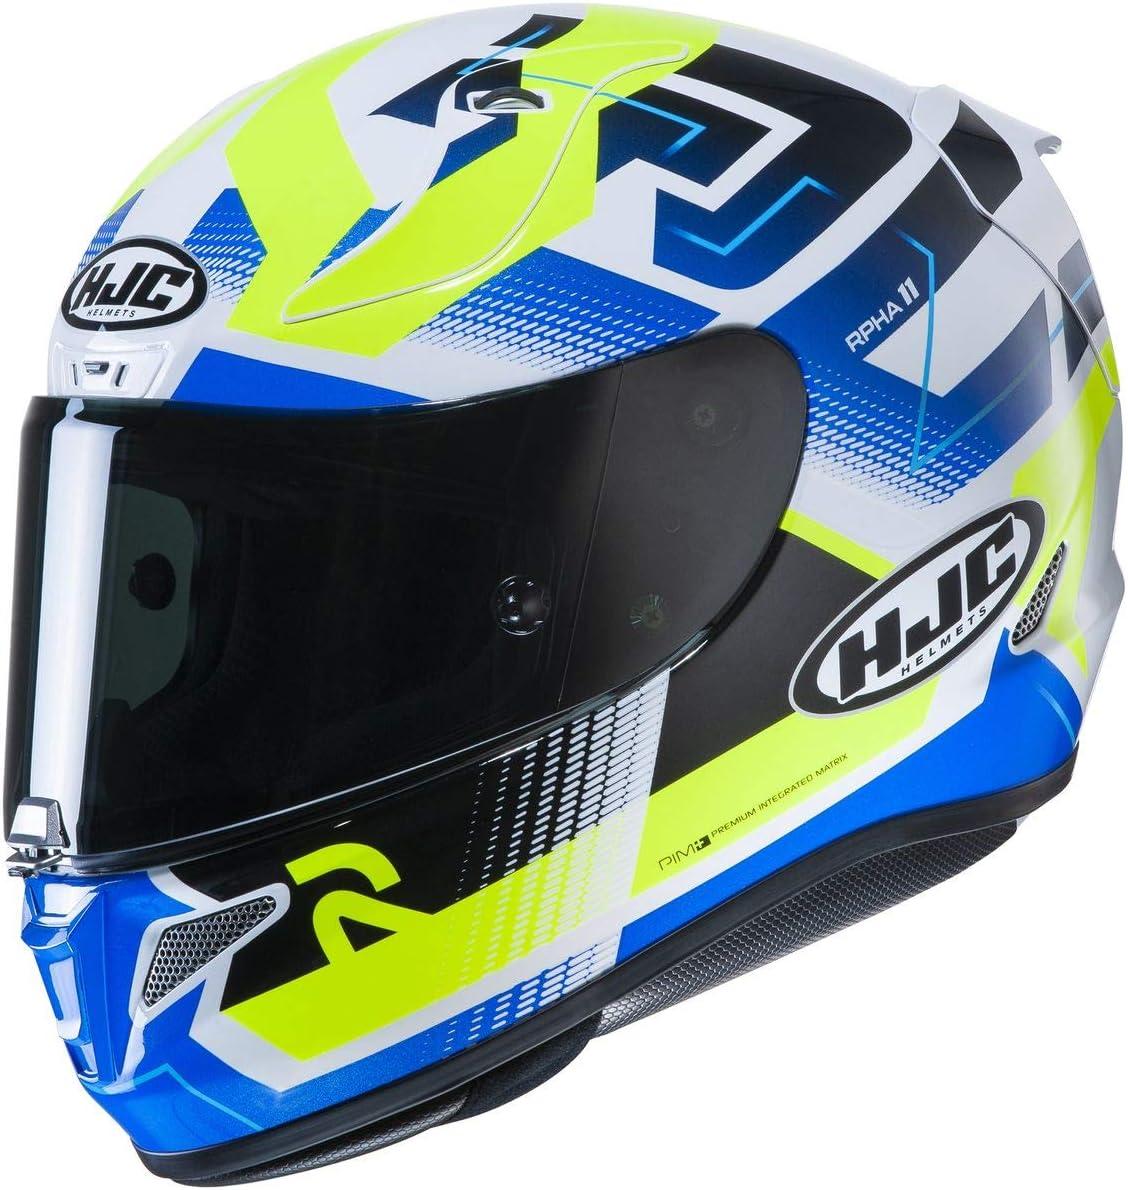 HJC Helmets RPHA Large-scale sale 11 Pro Helmet Blue Nectus X-Large - Miami Mall W HI-VIZ